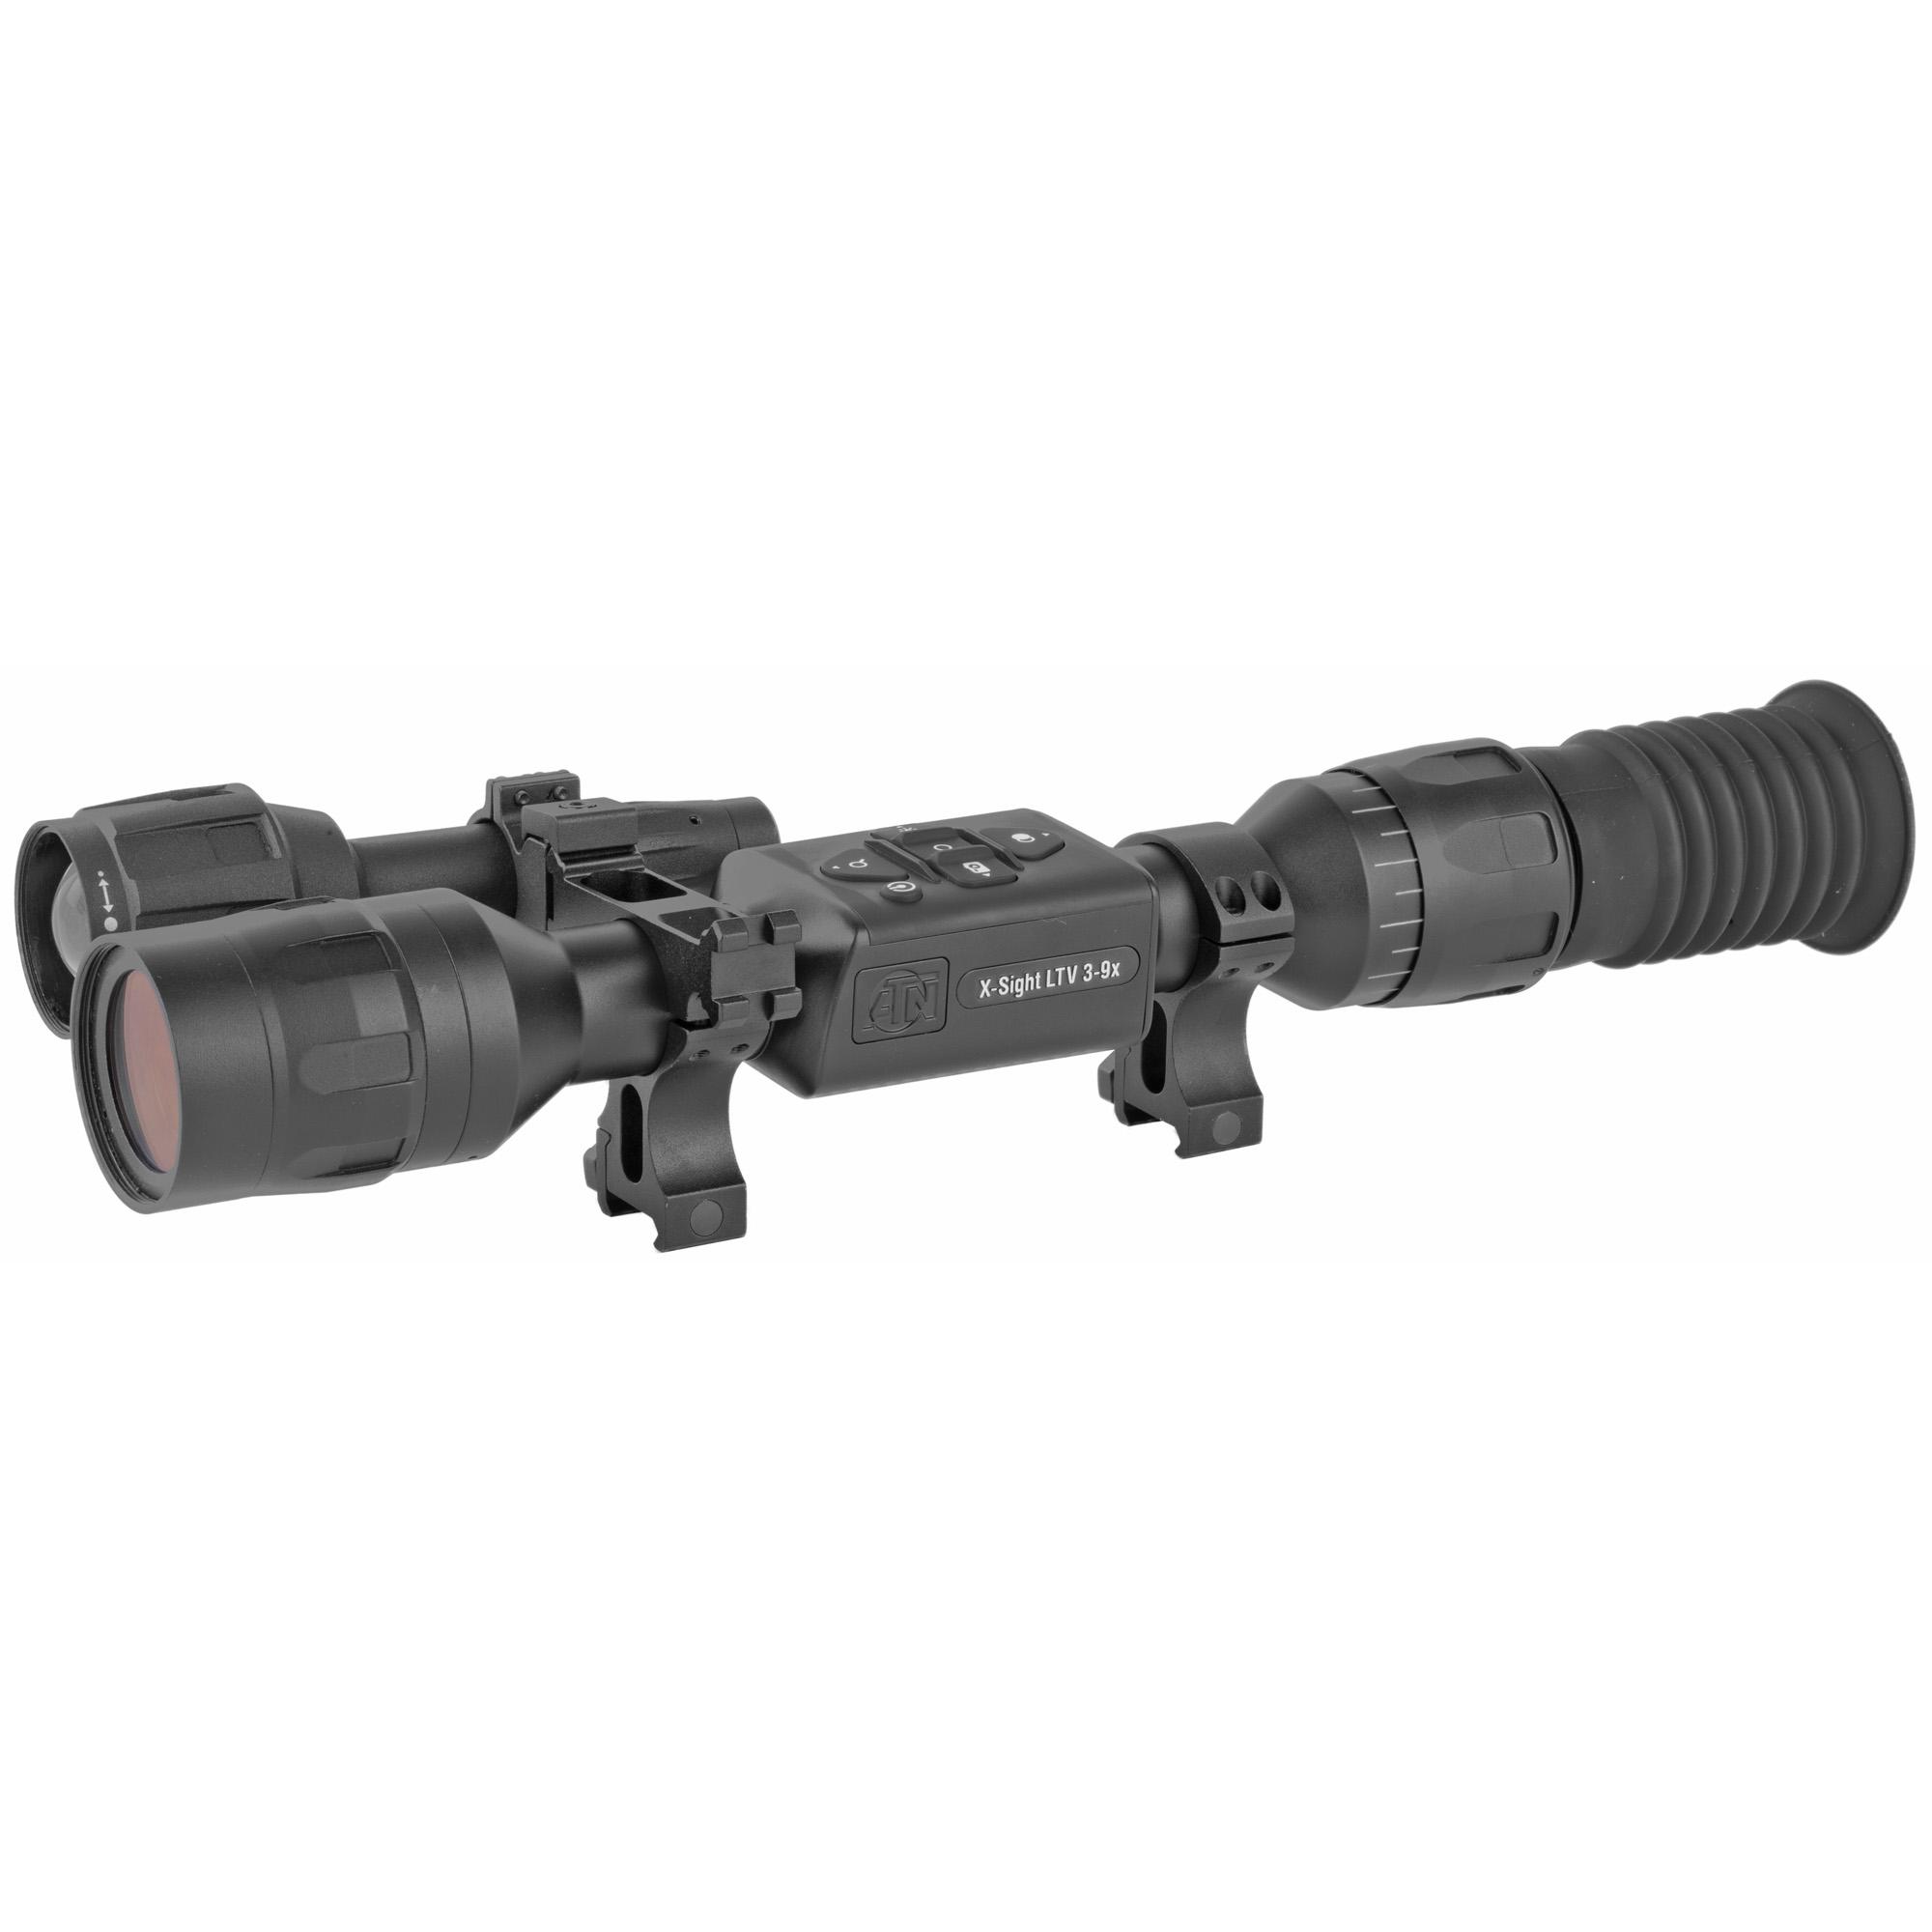 Atn X-sight Ltv 3-9x Day/night Scp